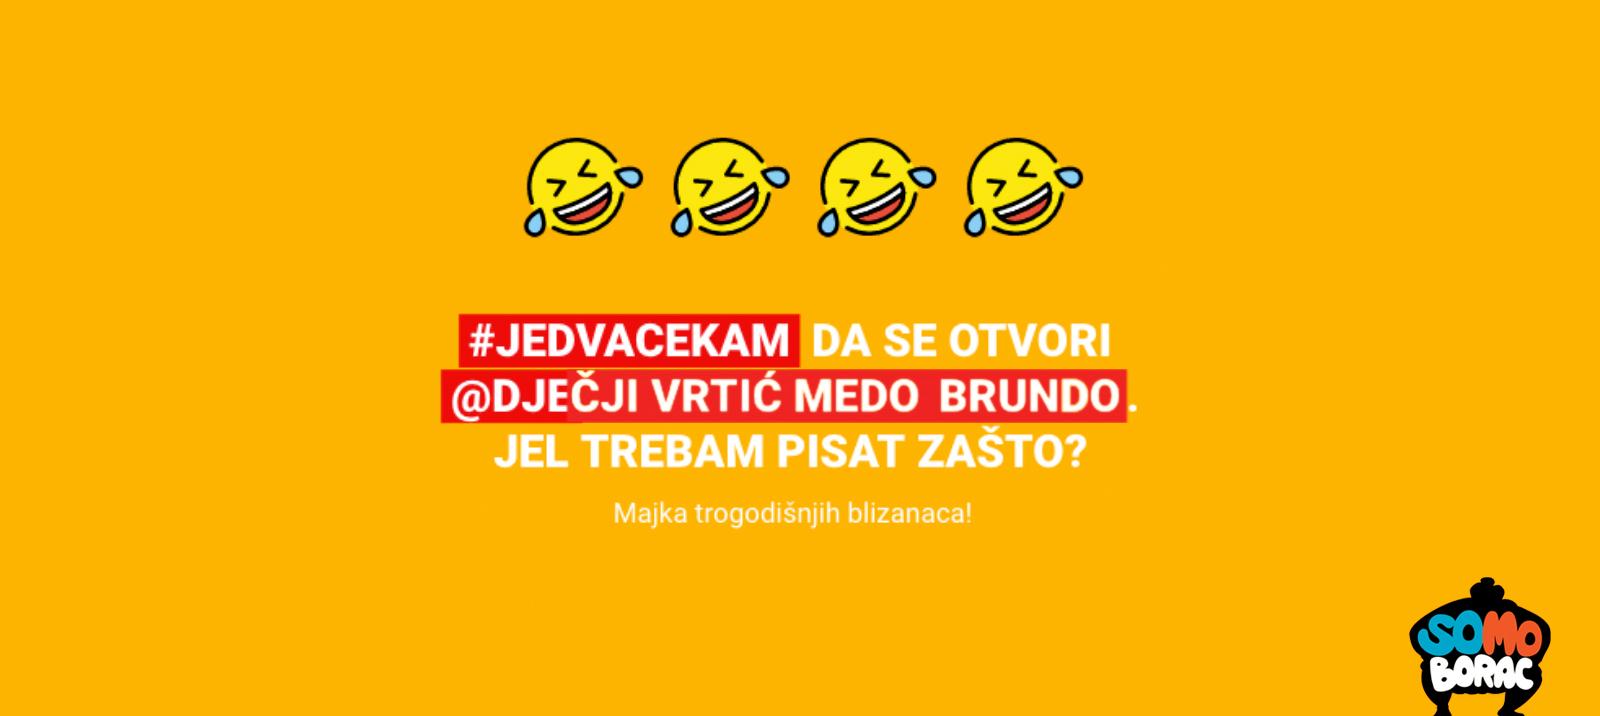 SoMo Borac award for #jedvacekam